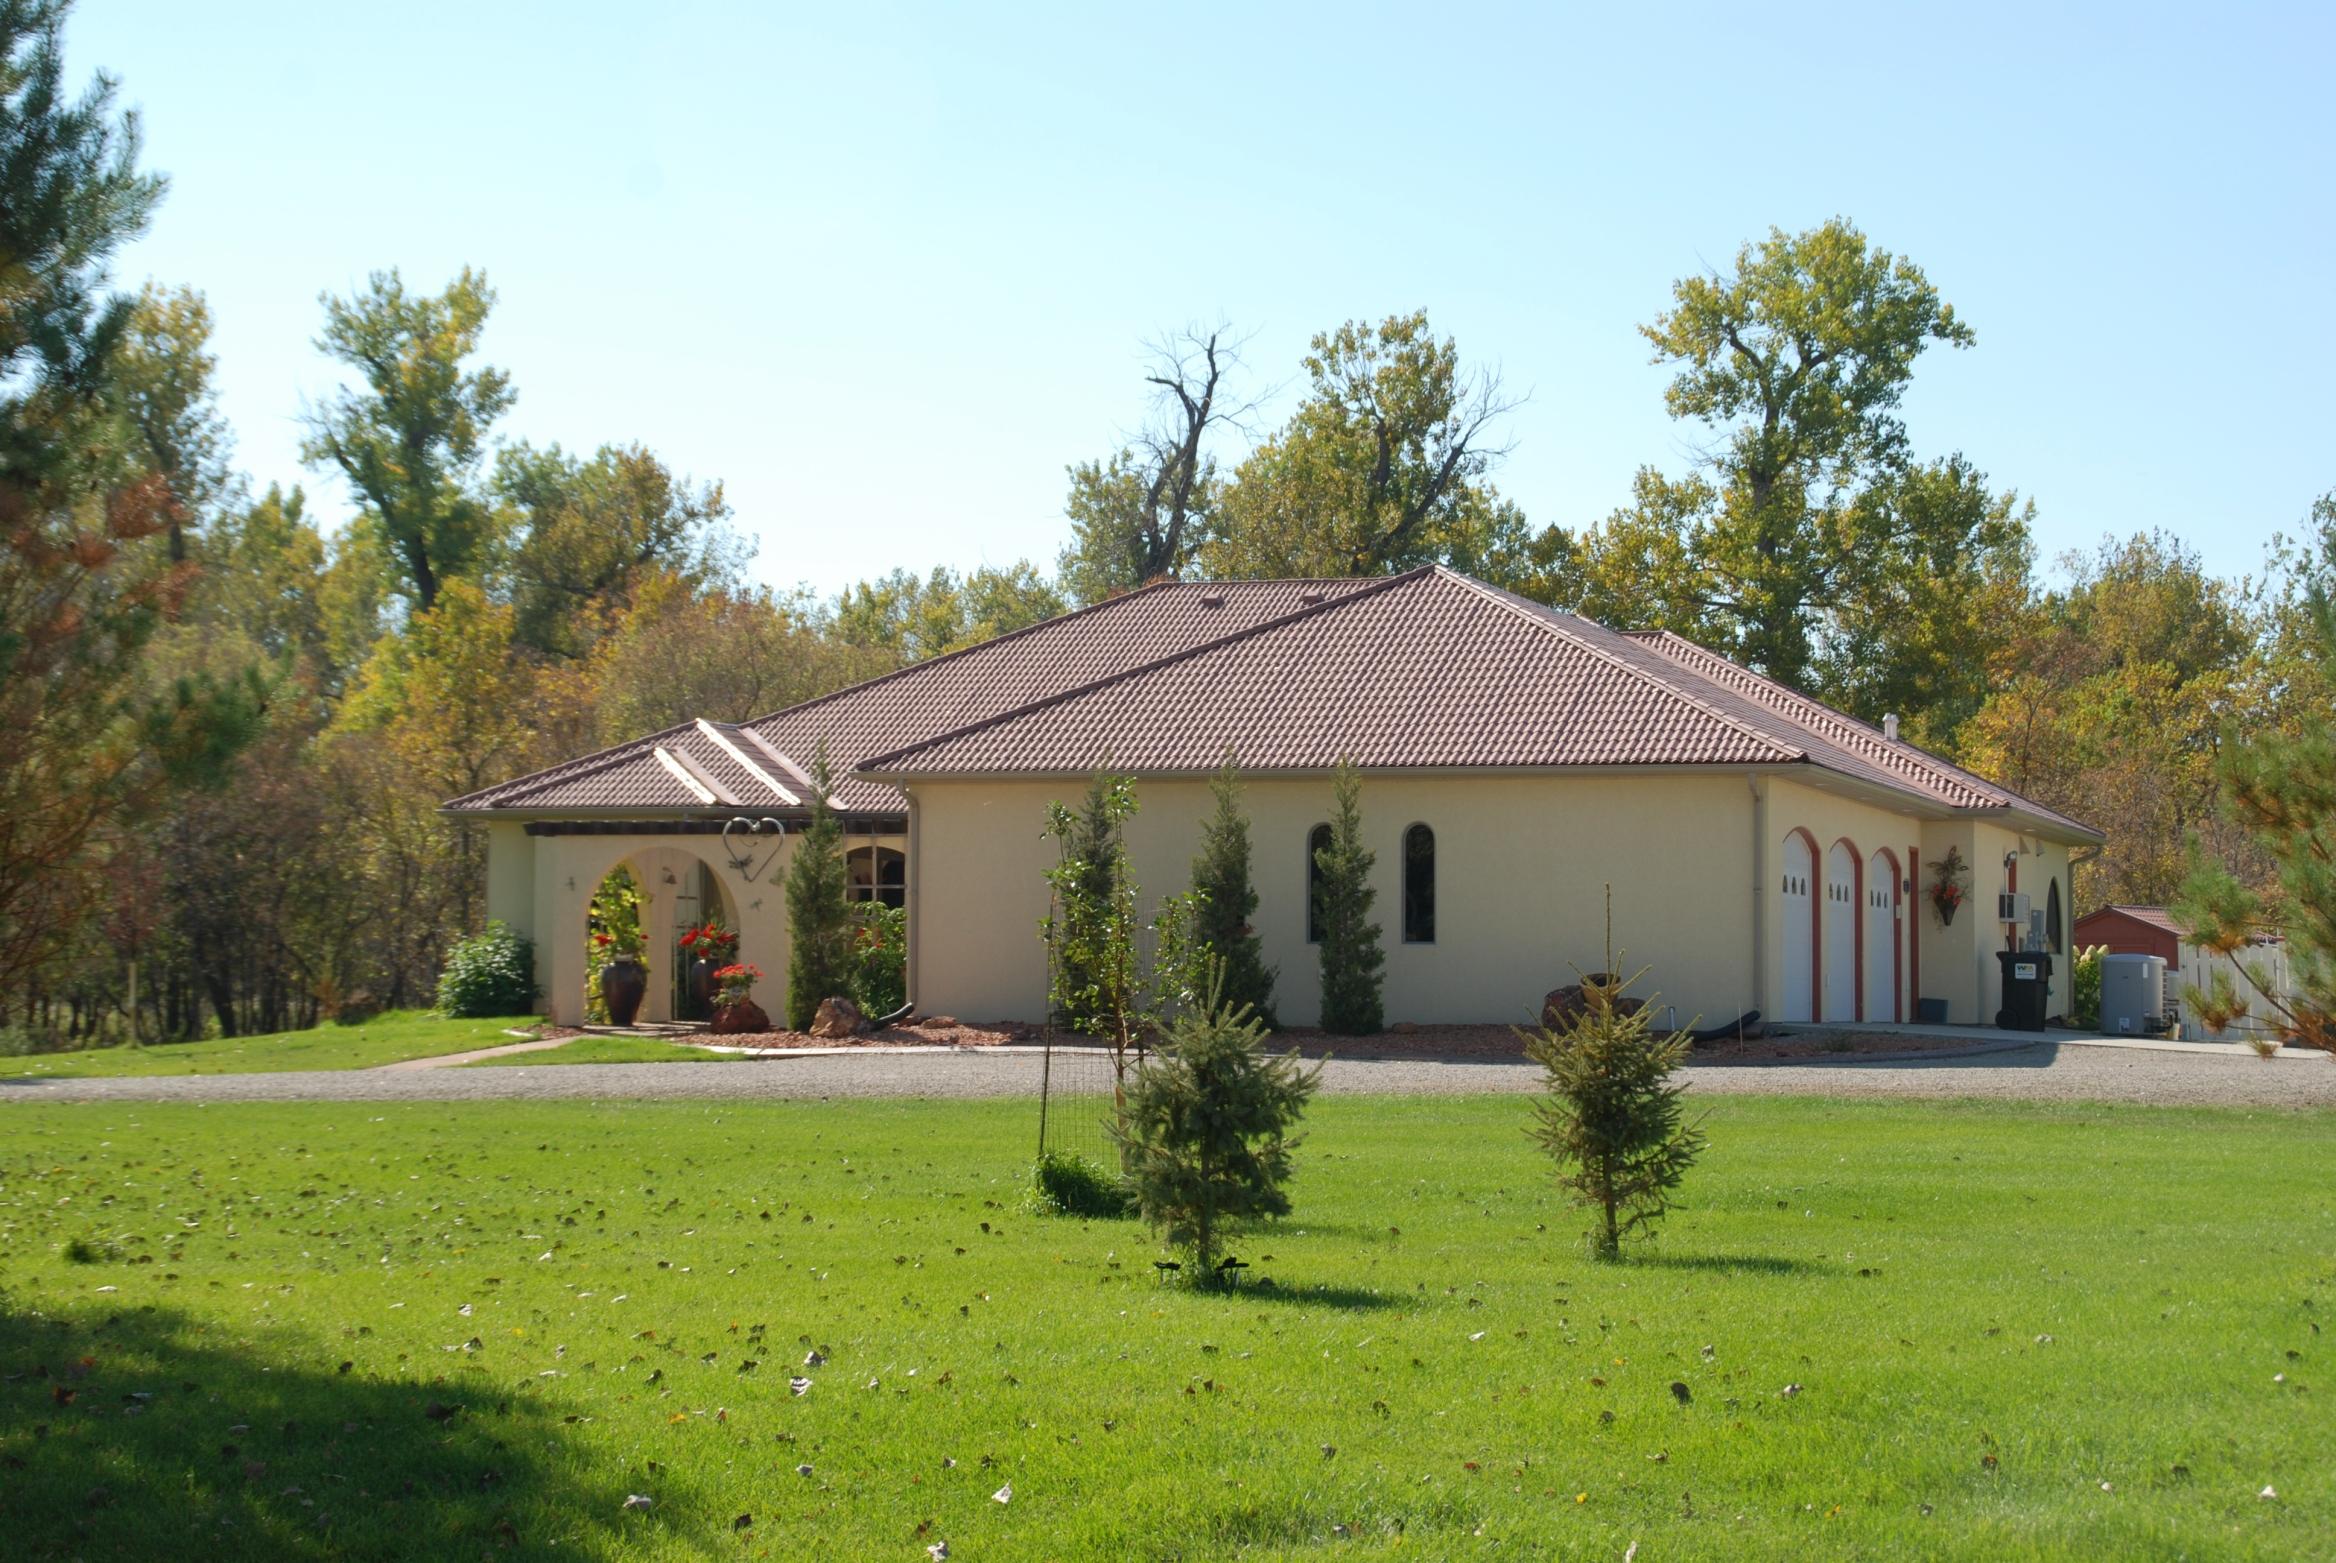 Spanish House Bismarck